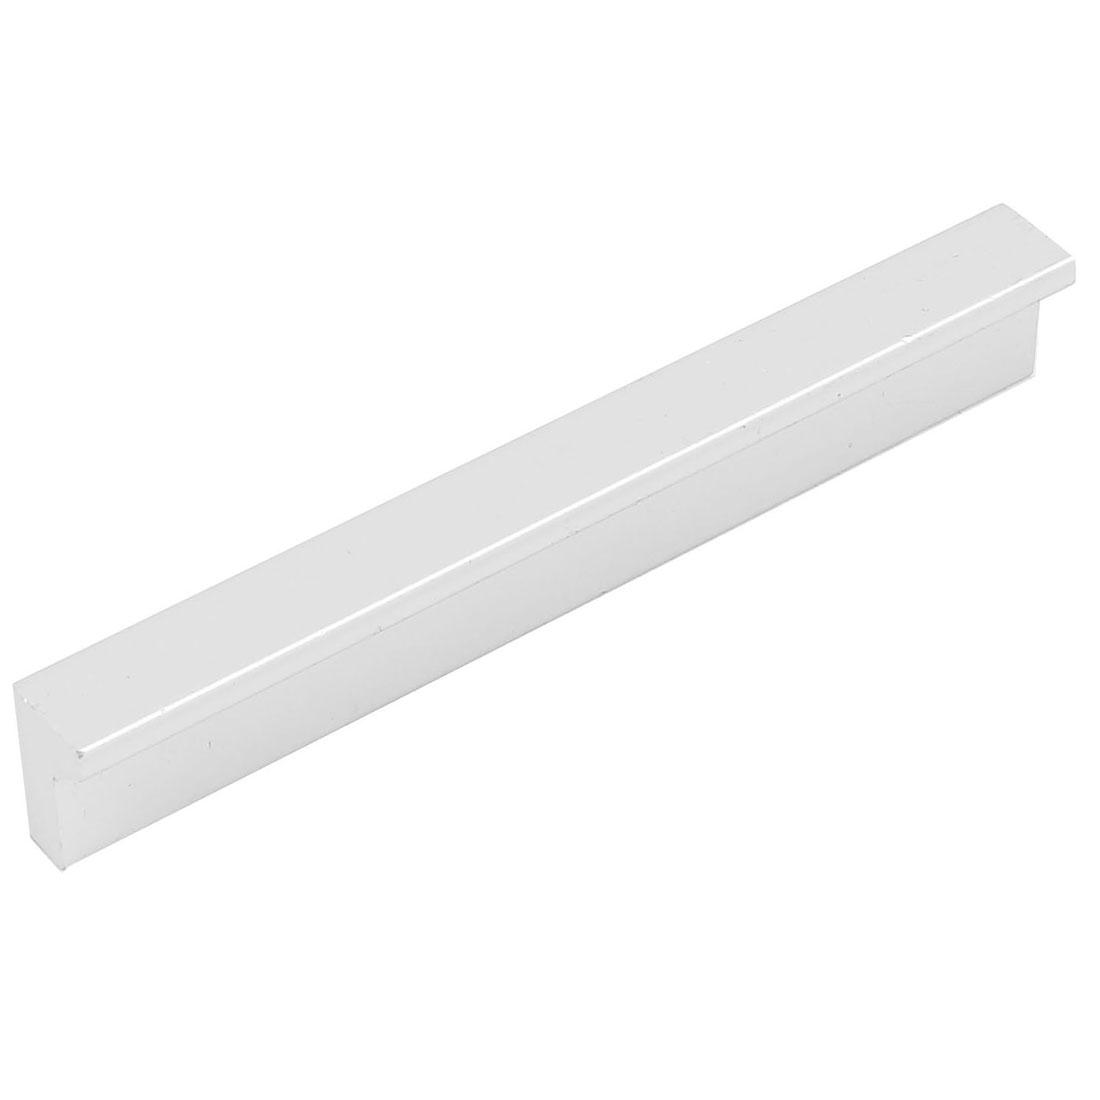 110mm Long Aluminium Cabinet Cupboard Kitchen Door Drawer Pull Handle